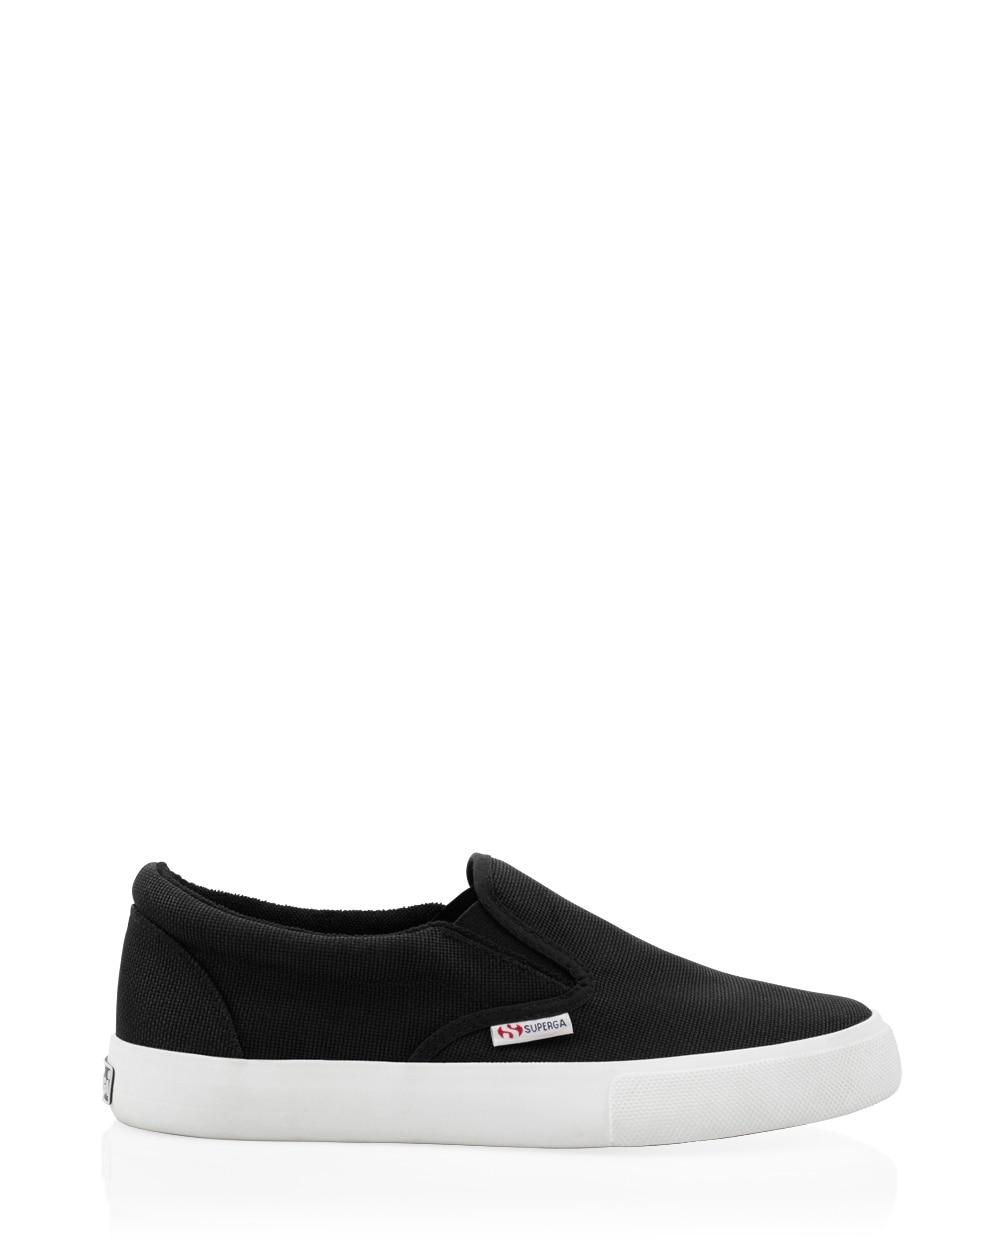 2311 Superga Slip-On Sneakers - White